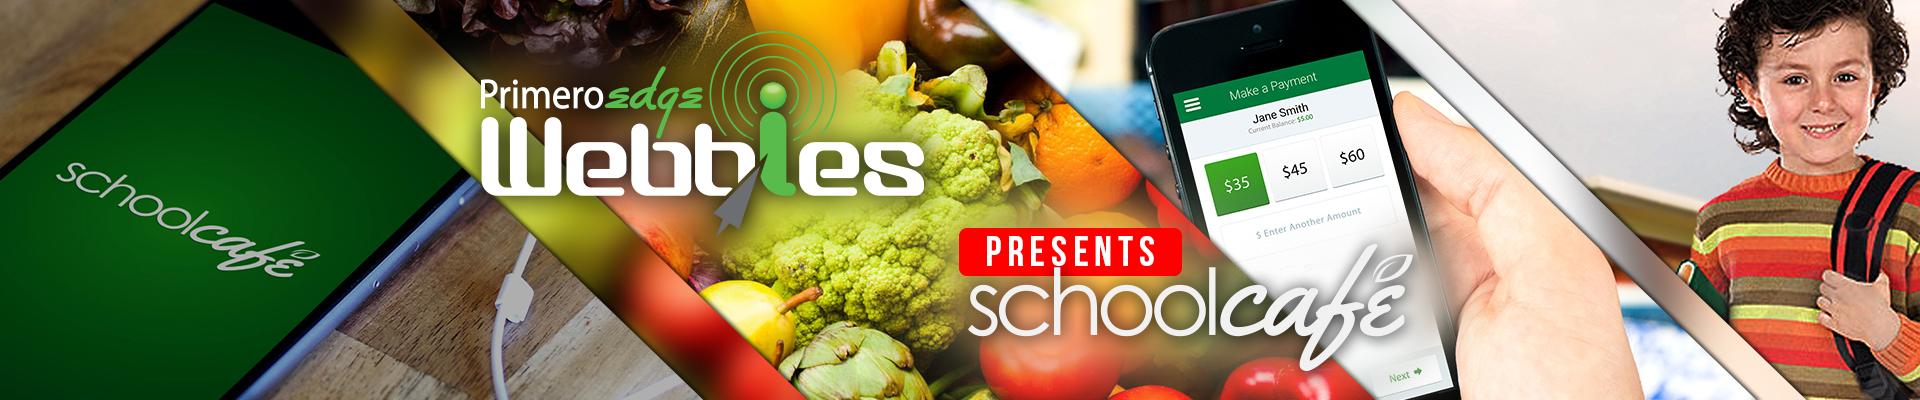 Webbies: SchoolCafe Header